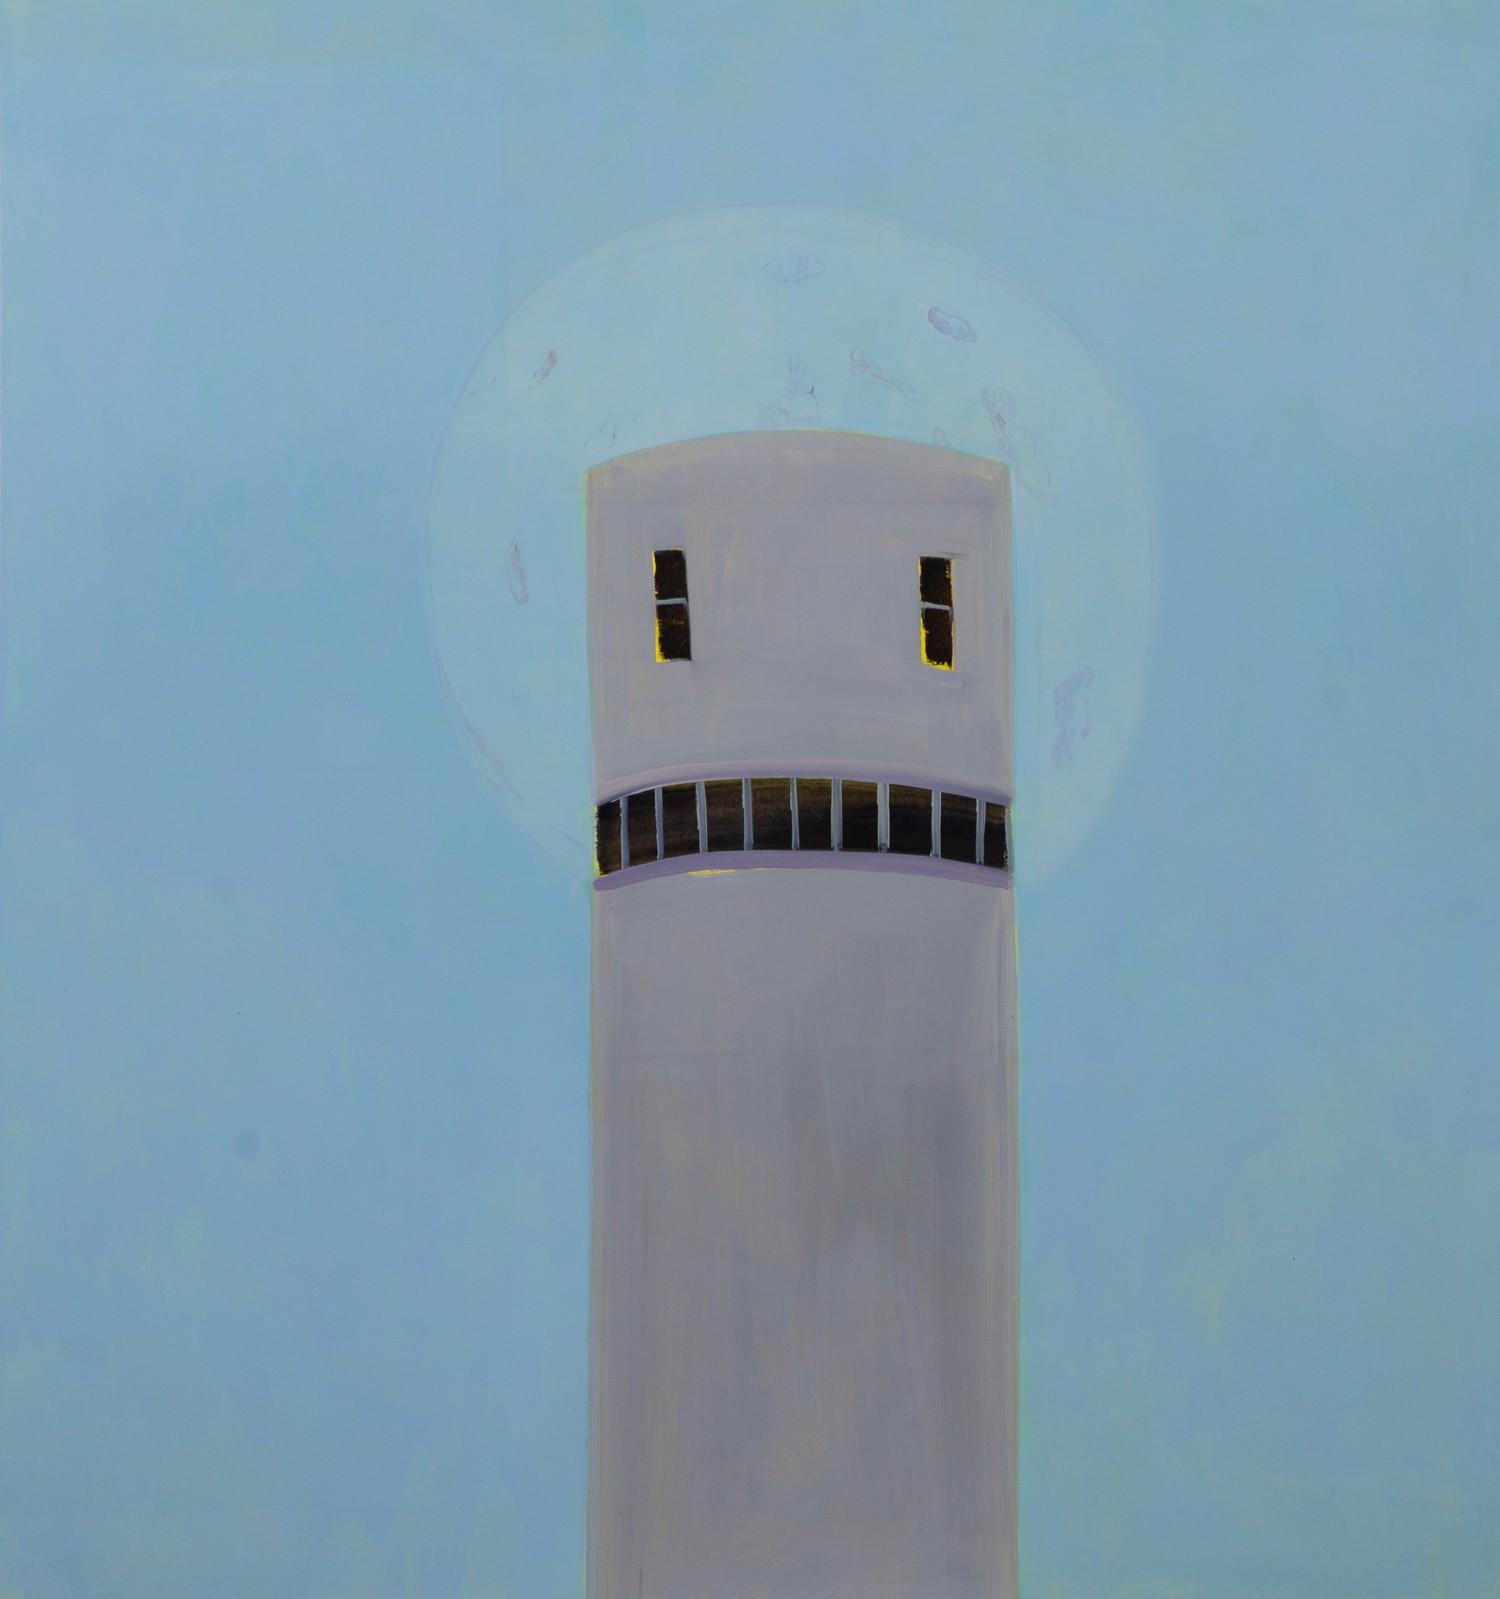 Alon Kedem, I see you, 2018 ,Oil on canvas, 160x150 cm, $8,000-1500x1599